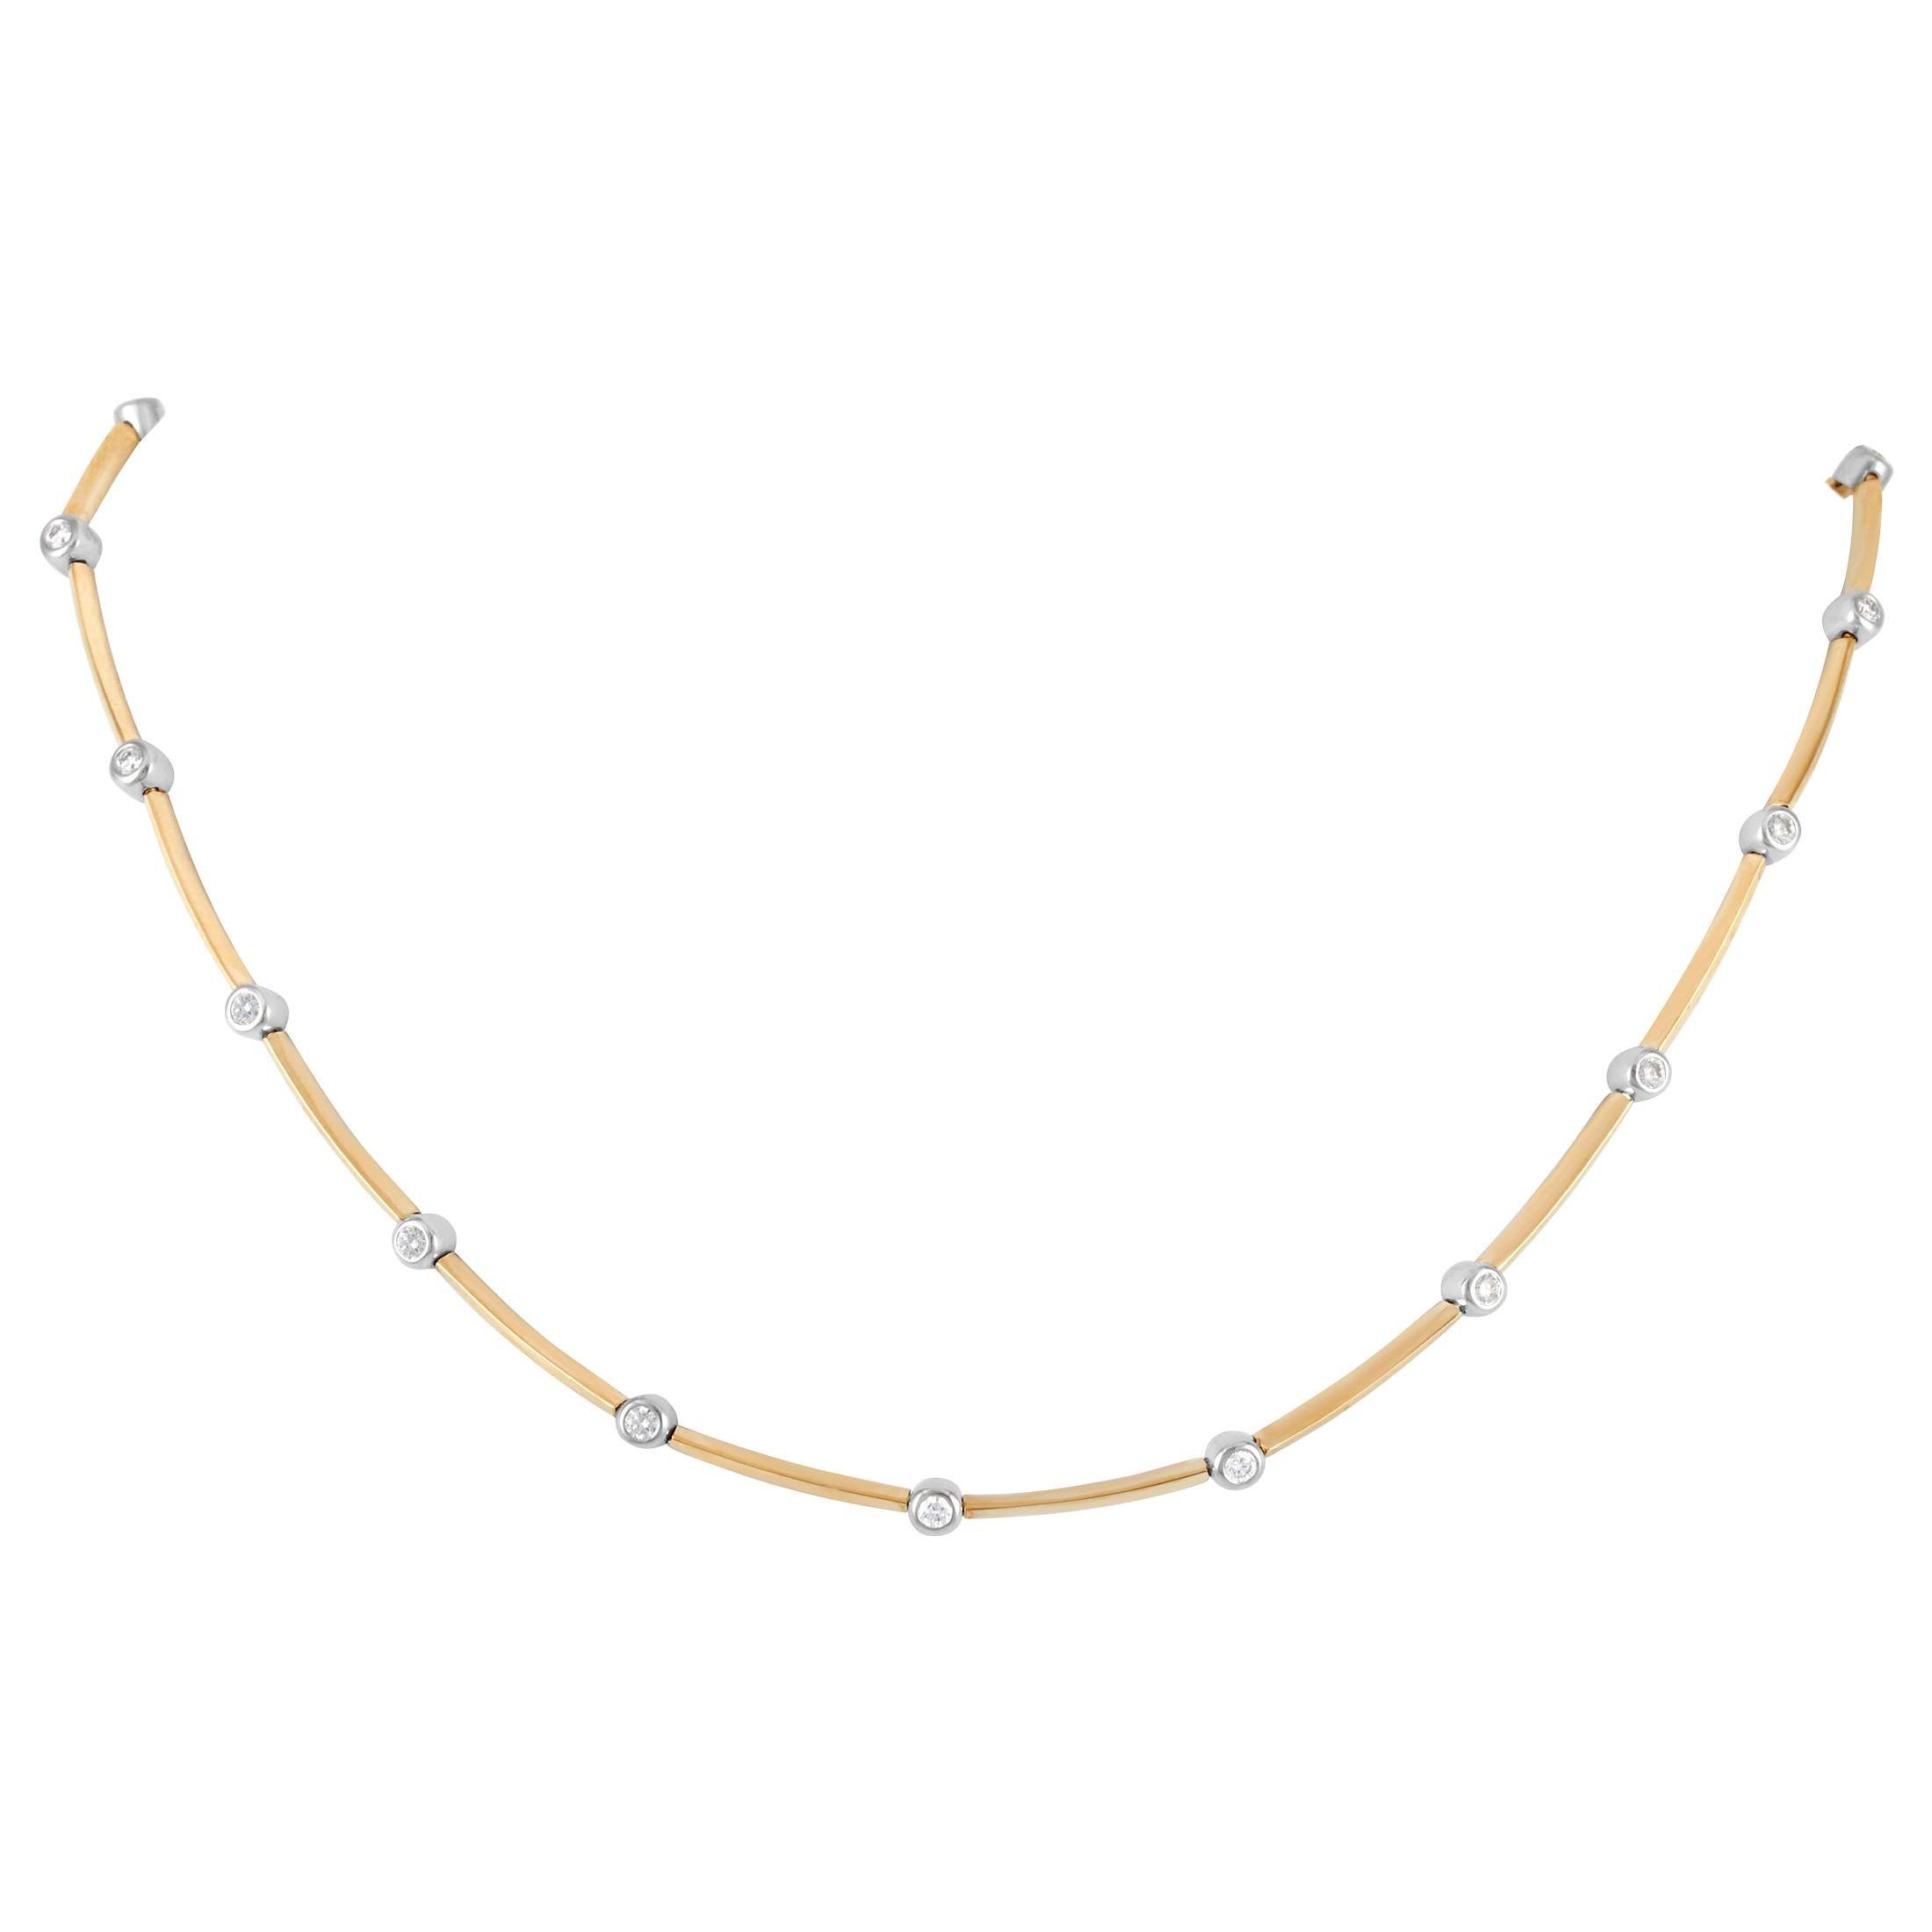 Tiffany & Co. 18 Karat Yellow Gold 1.00 Carat Diamond Necklace